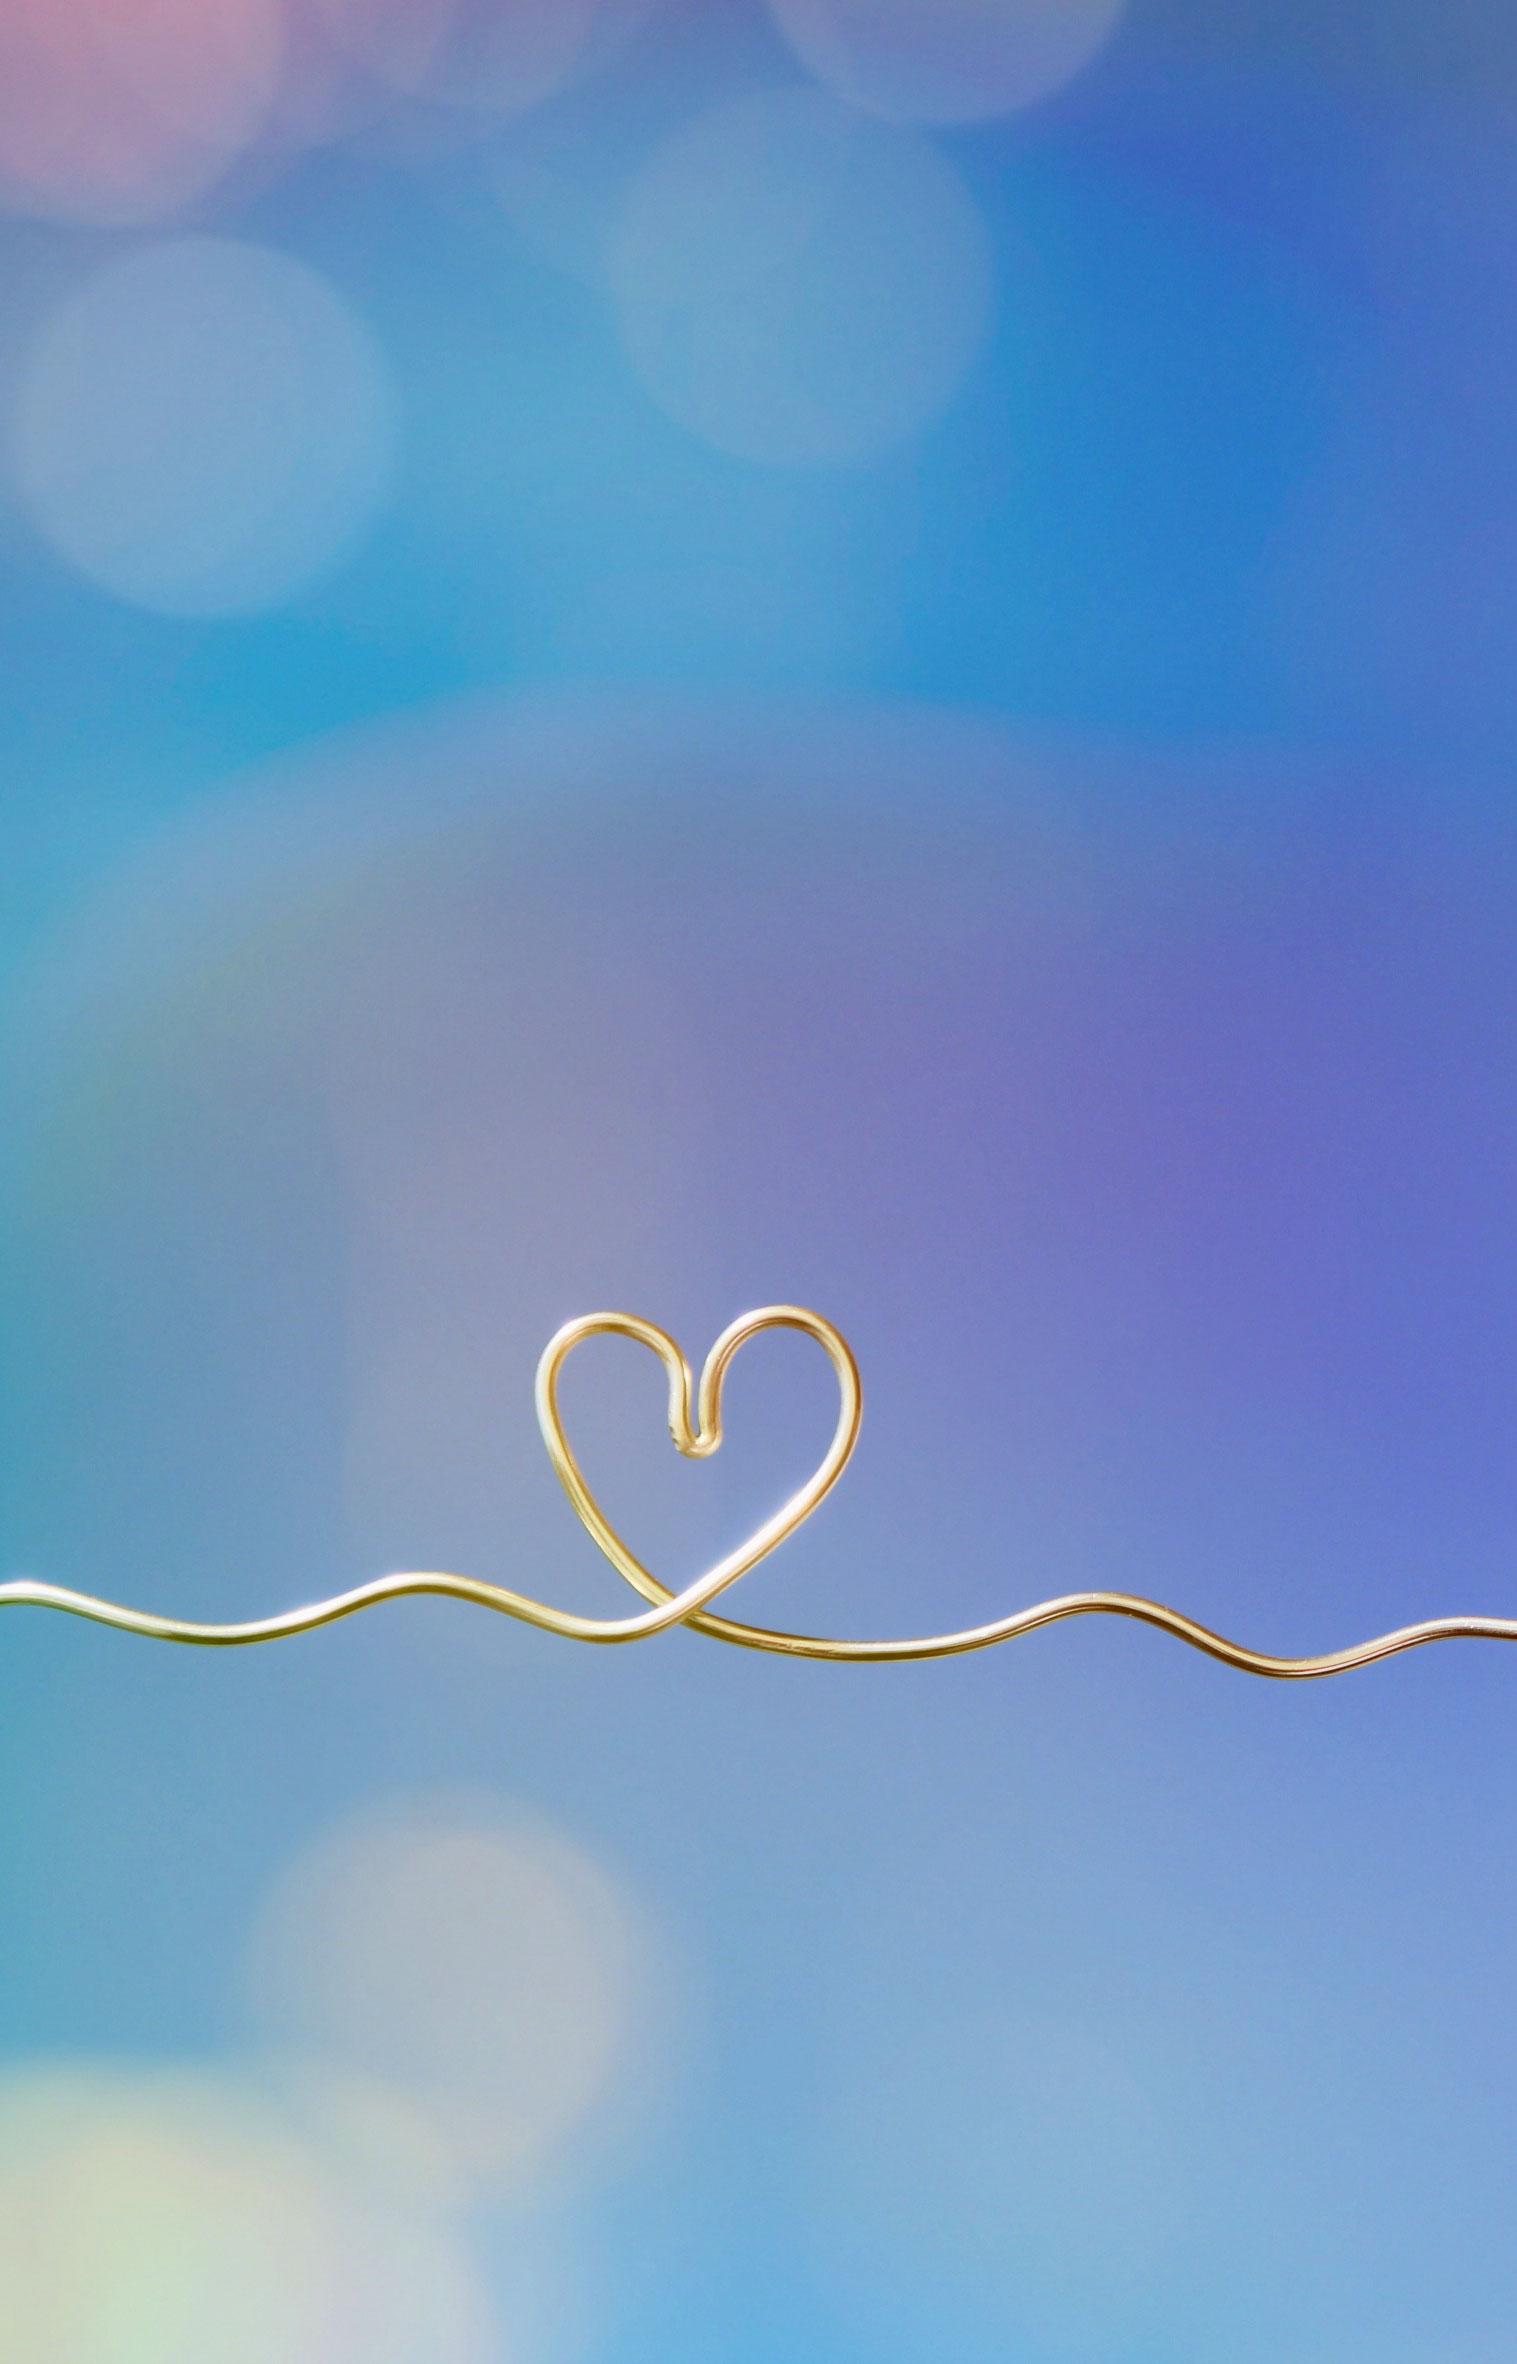 love Latest Girlfriend Whatsapp Profile Images